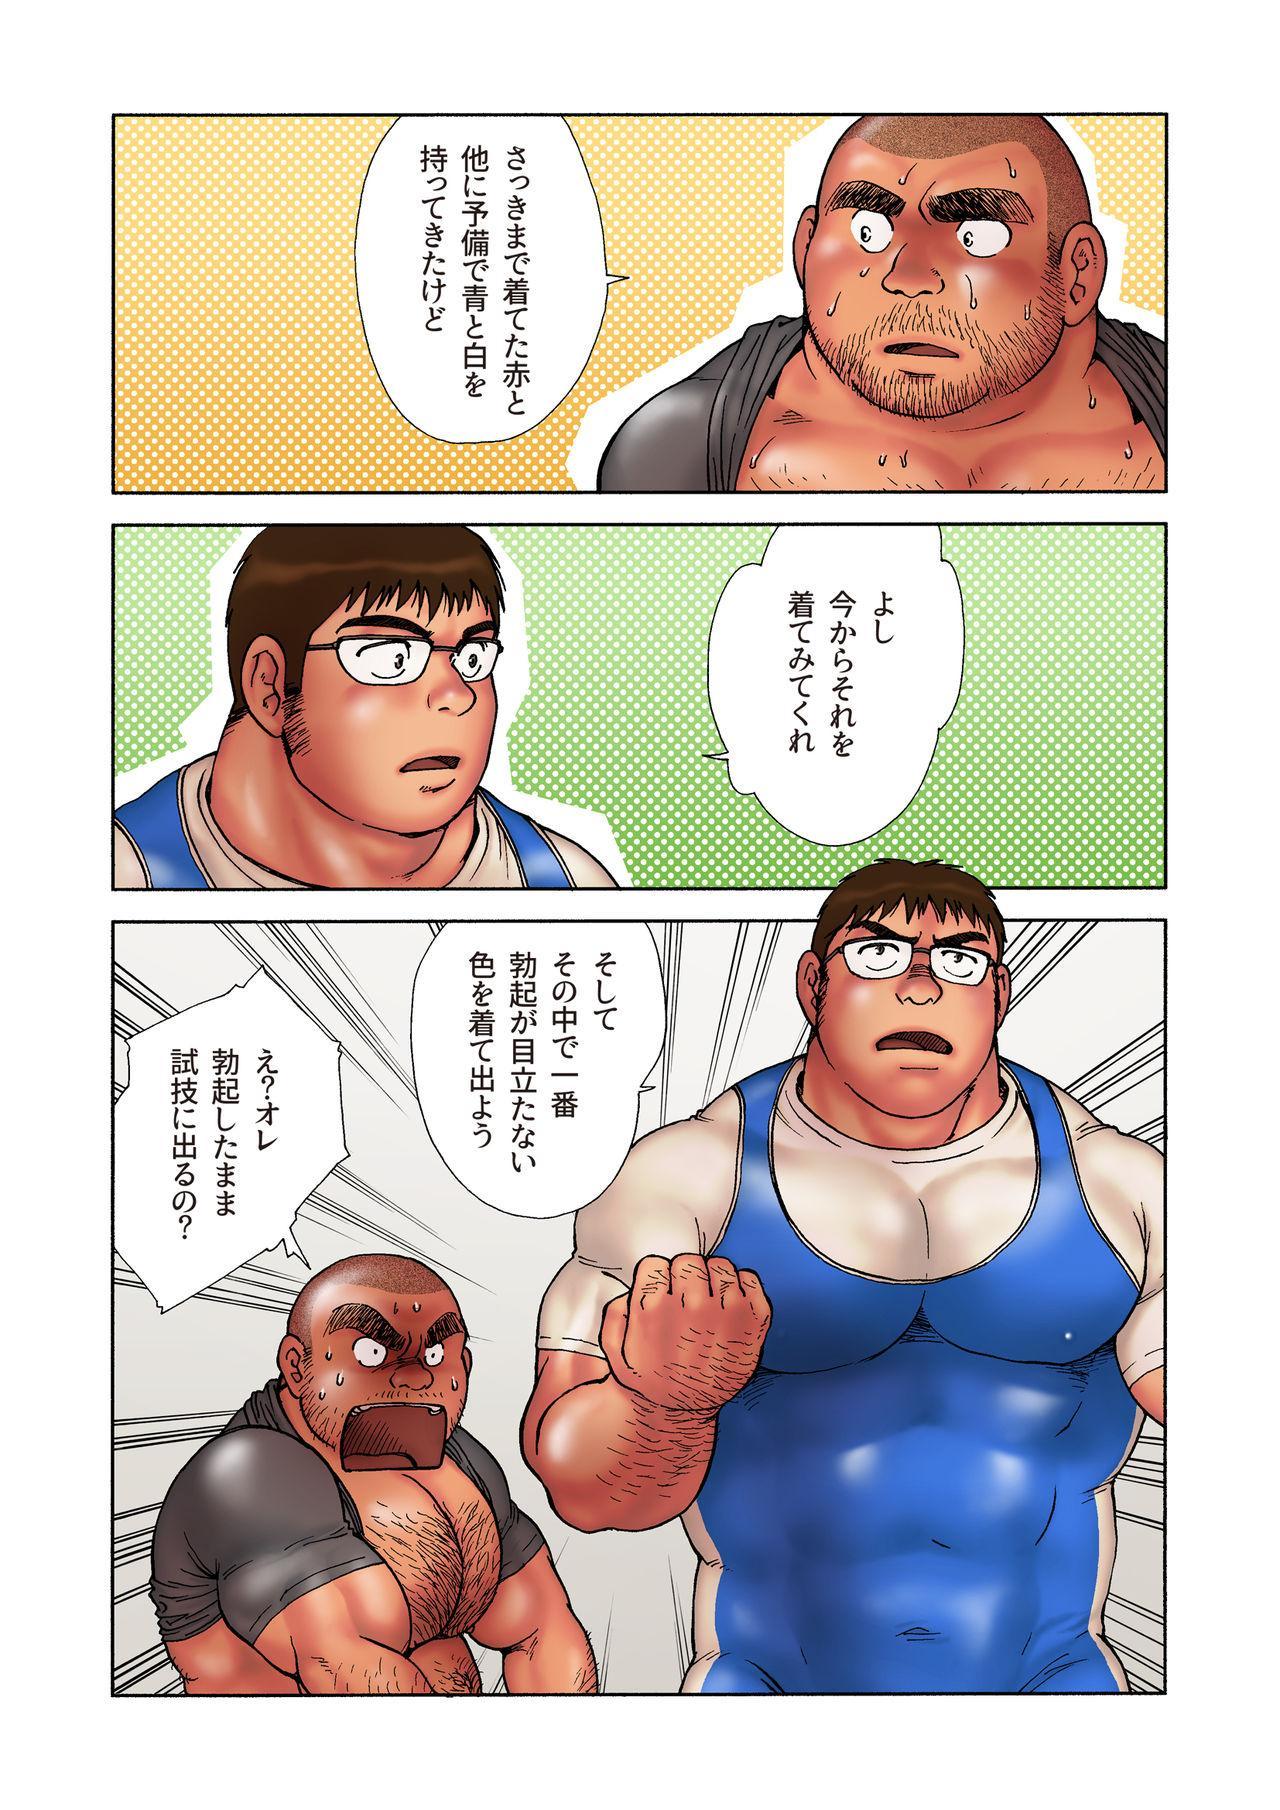 Danshi Koukousei Weightlifter Shiai-chuu, Osae kirenai Wakai Takeri 49